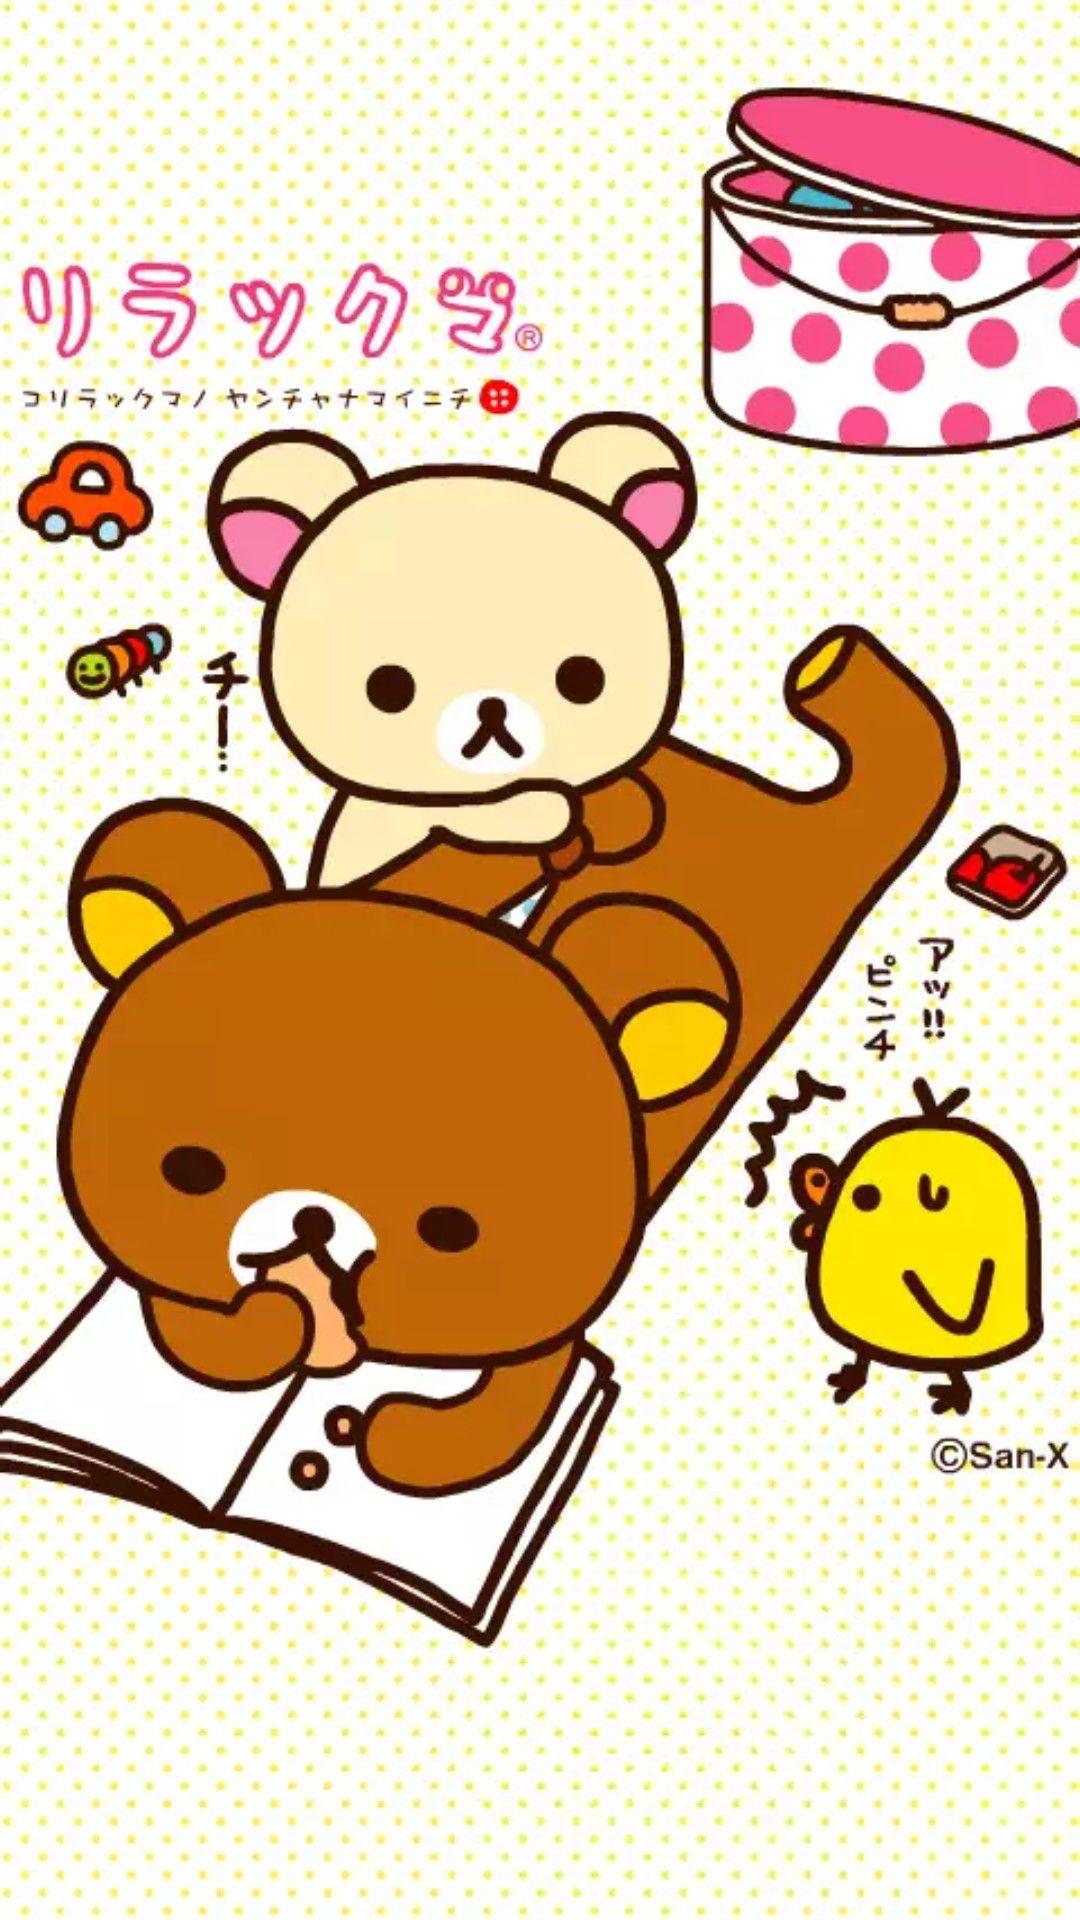 ค มะ おしゃれまとめの人気アイデア Pinterest Choifai かわいい